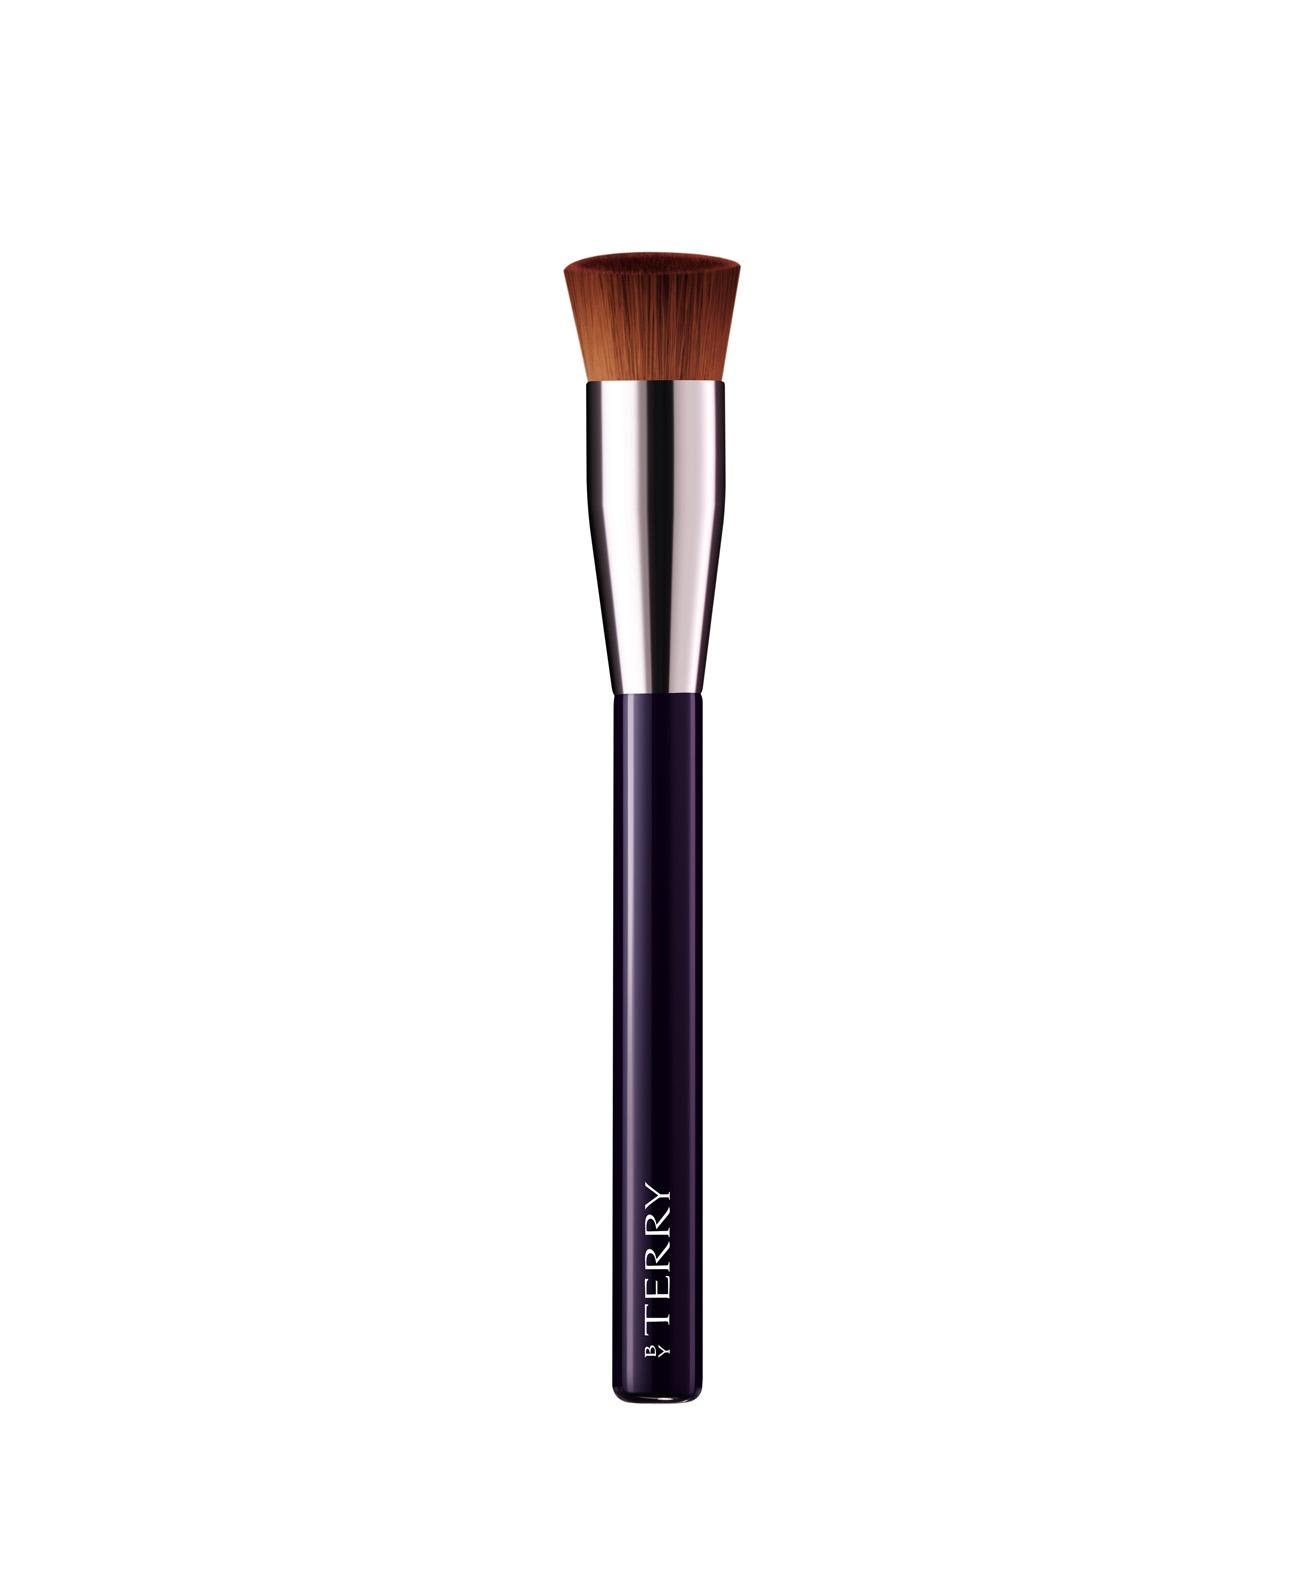 4-Tool-Expert-Stencil-Foundation-Brush-pennello-per-fondotinta-Linea-accessori-makeup-professionali-By-Terry-Dispar-SpA.jpg